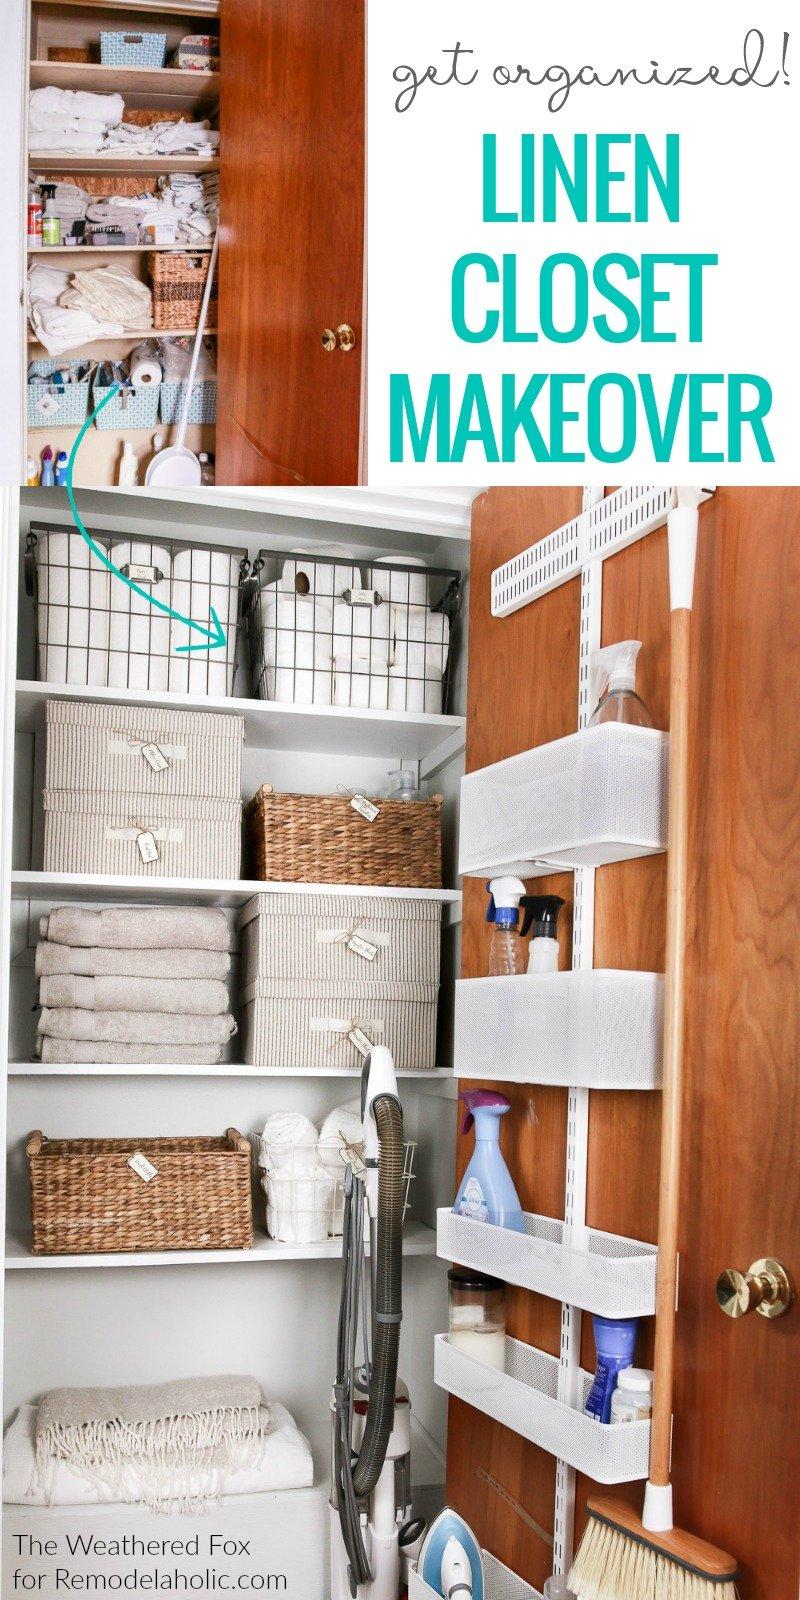 Organized Linen Closet Makeover Remodelaholic Bloglovin